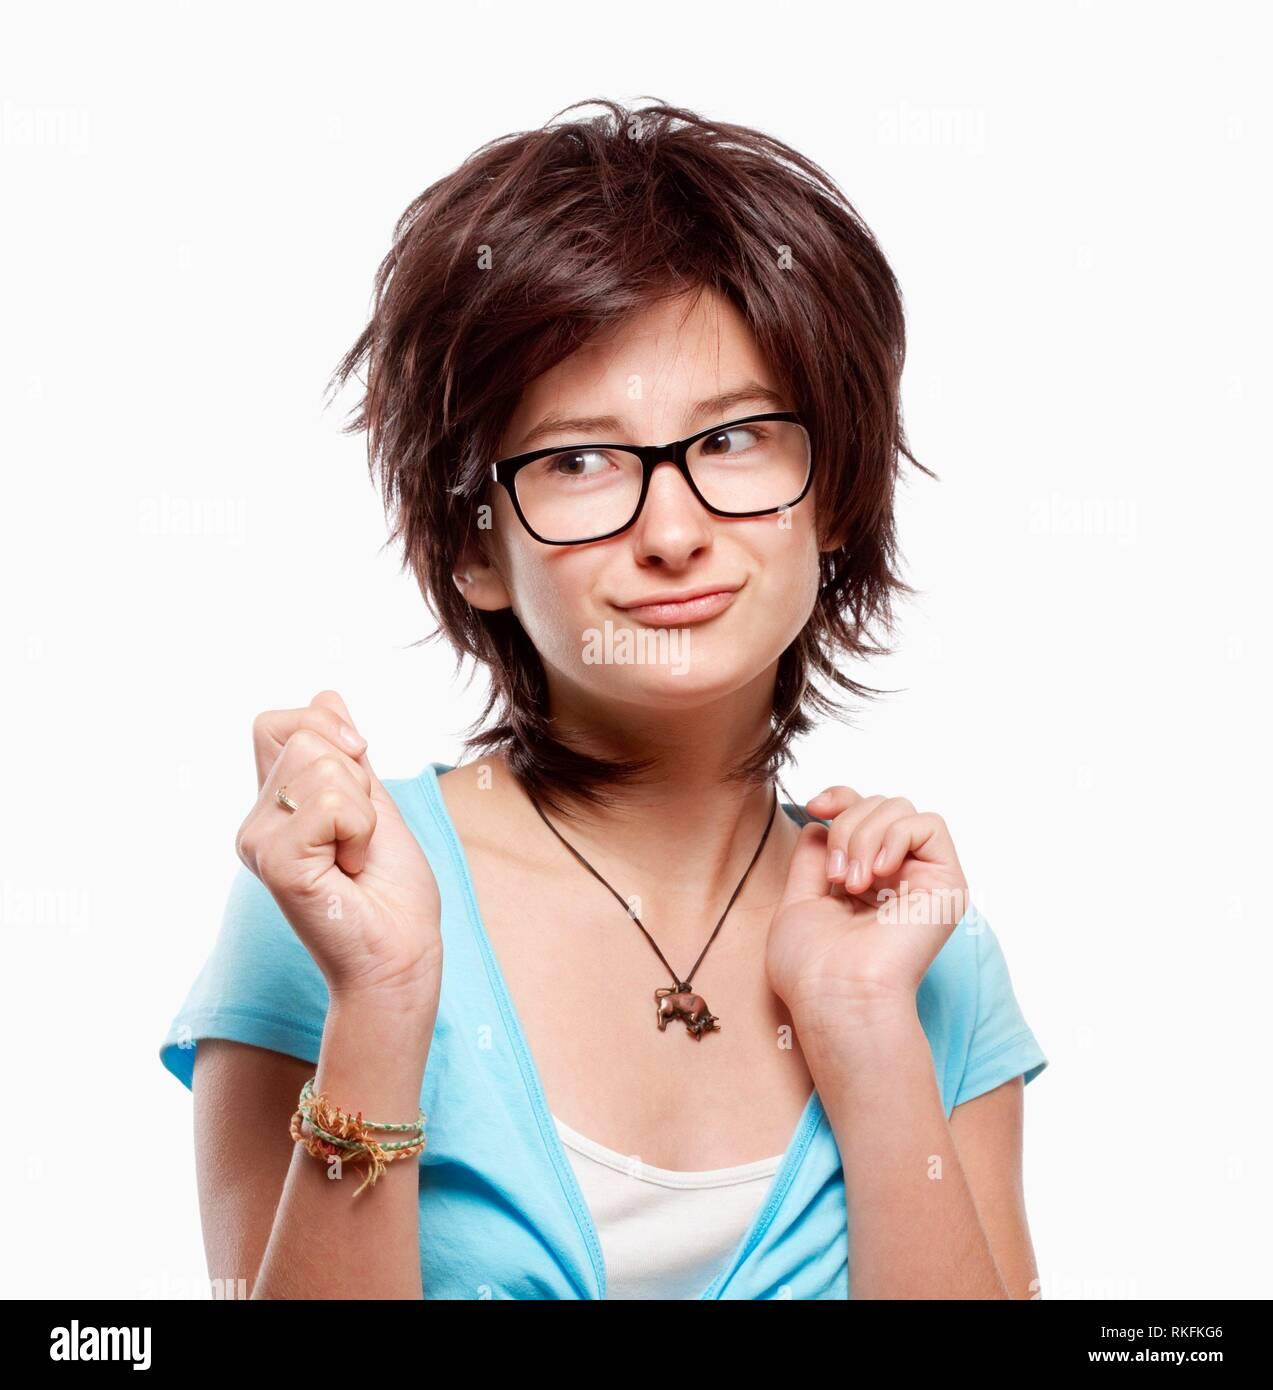 9c55ff335460f Girl Brown Hair Glasses Stock Photos   Girl Brown Hair Glasses Stock ...